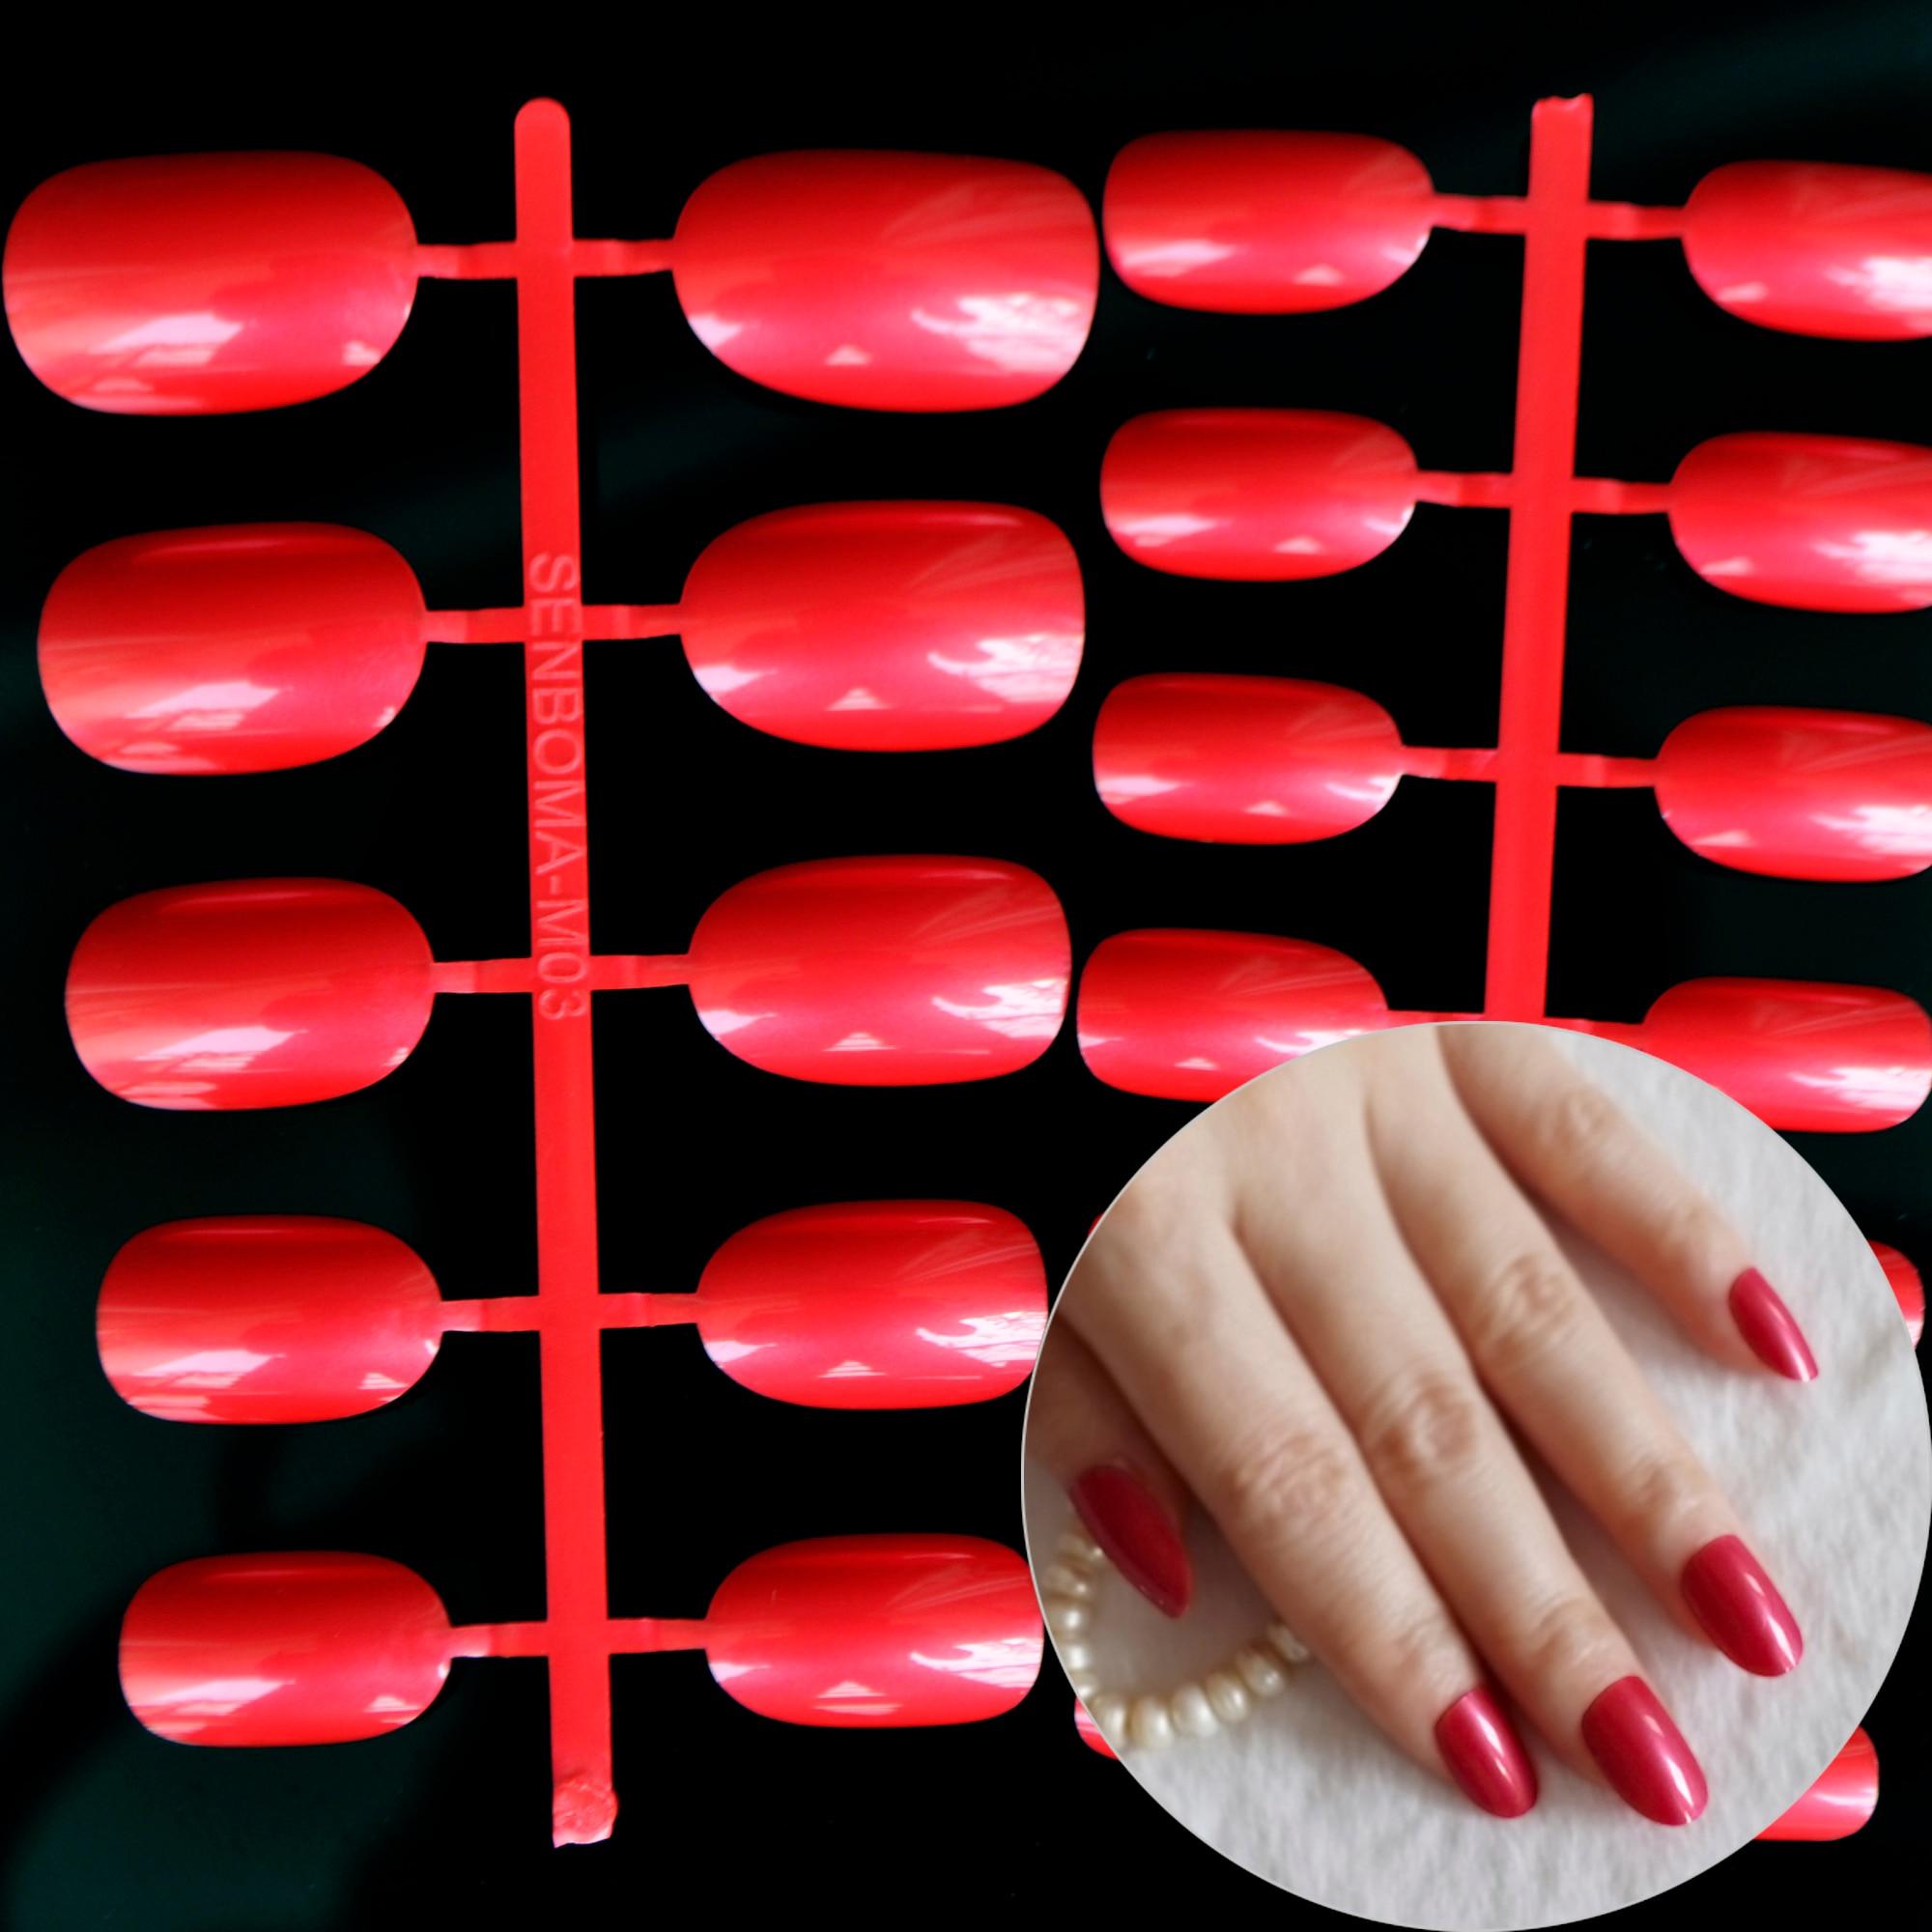 Acryl Falsche Oval Nägel Braut Rose Rot Nagel Fingernägel Full Wrap ...